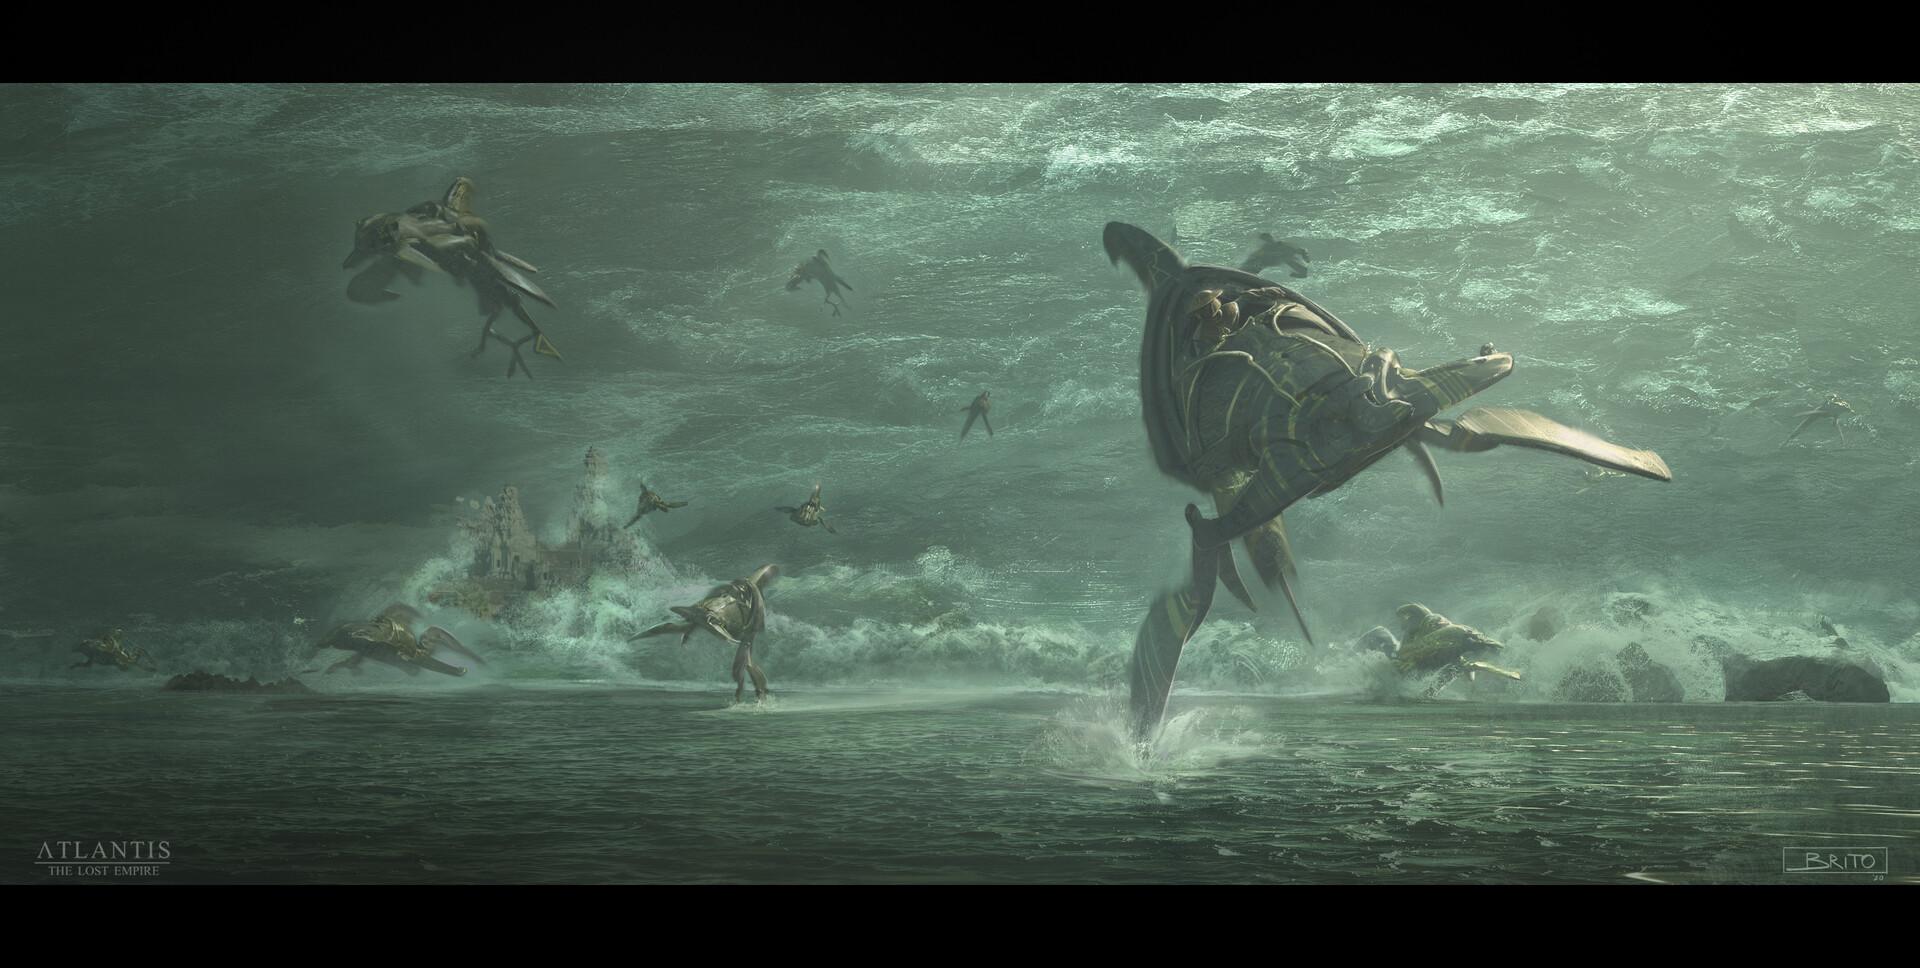 Atlantide, l'Empire Perdu [Walt Disney - 2001] - Page 8 Eduardo-brito-tsunami-shot-01